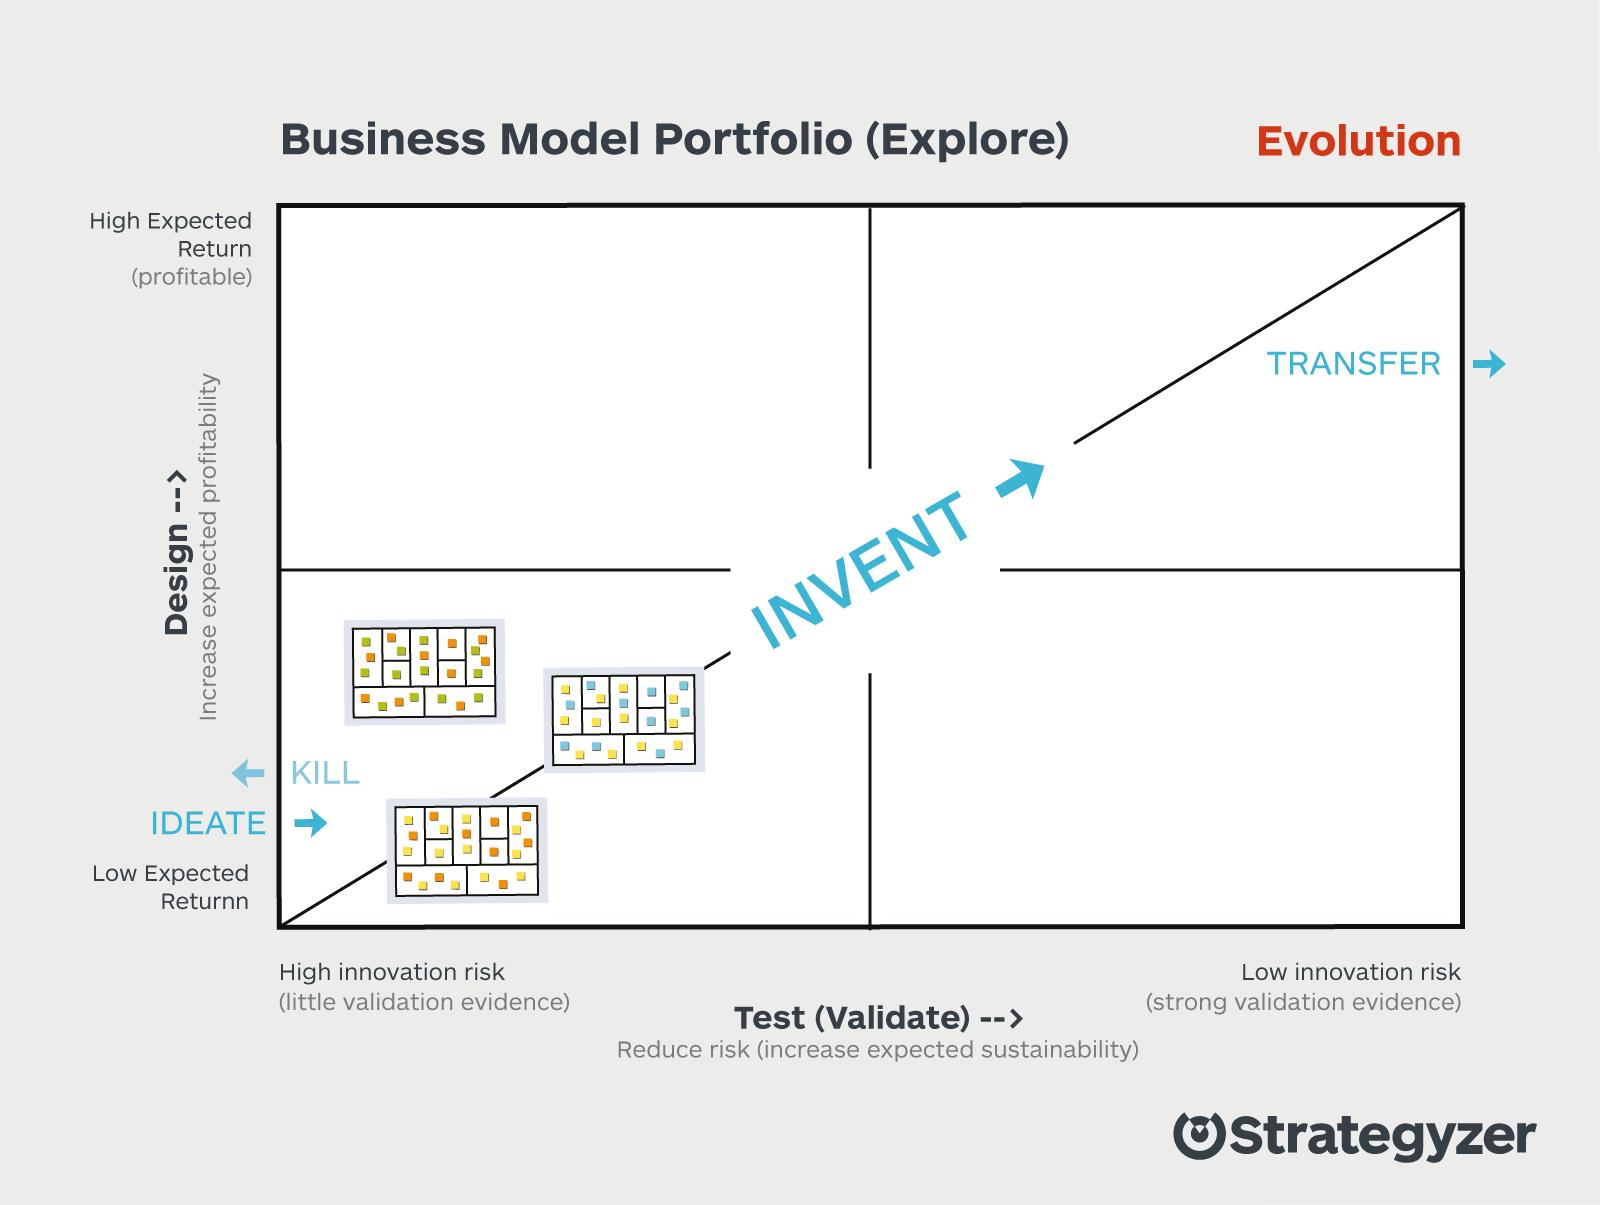 Explore-Business-Model-Portfolio-1.png